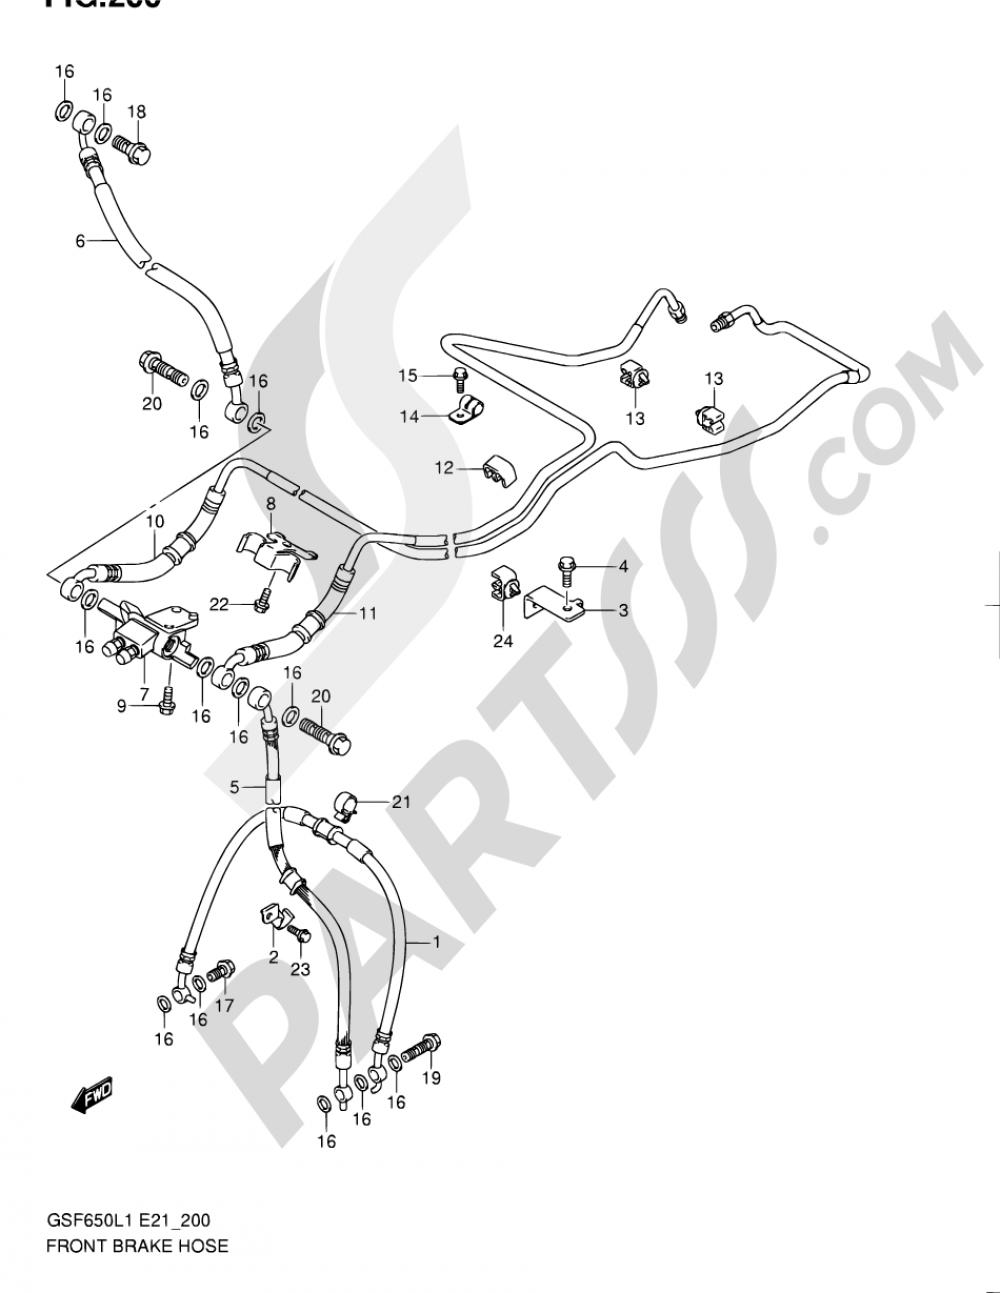 200 - FRONT BRAKE HOSE (GSF650UAL1 E21) Suzuki BANDIT GSF650S 2011